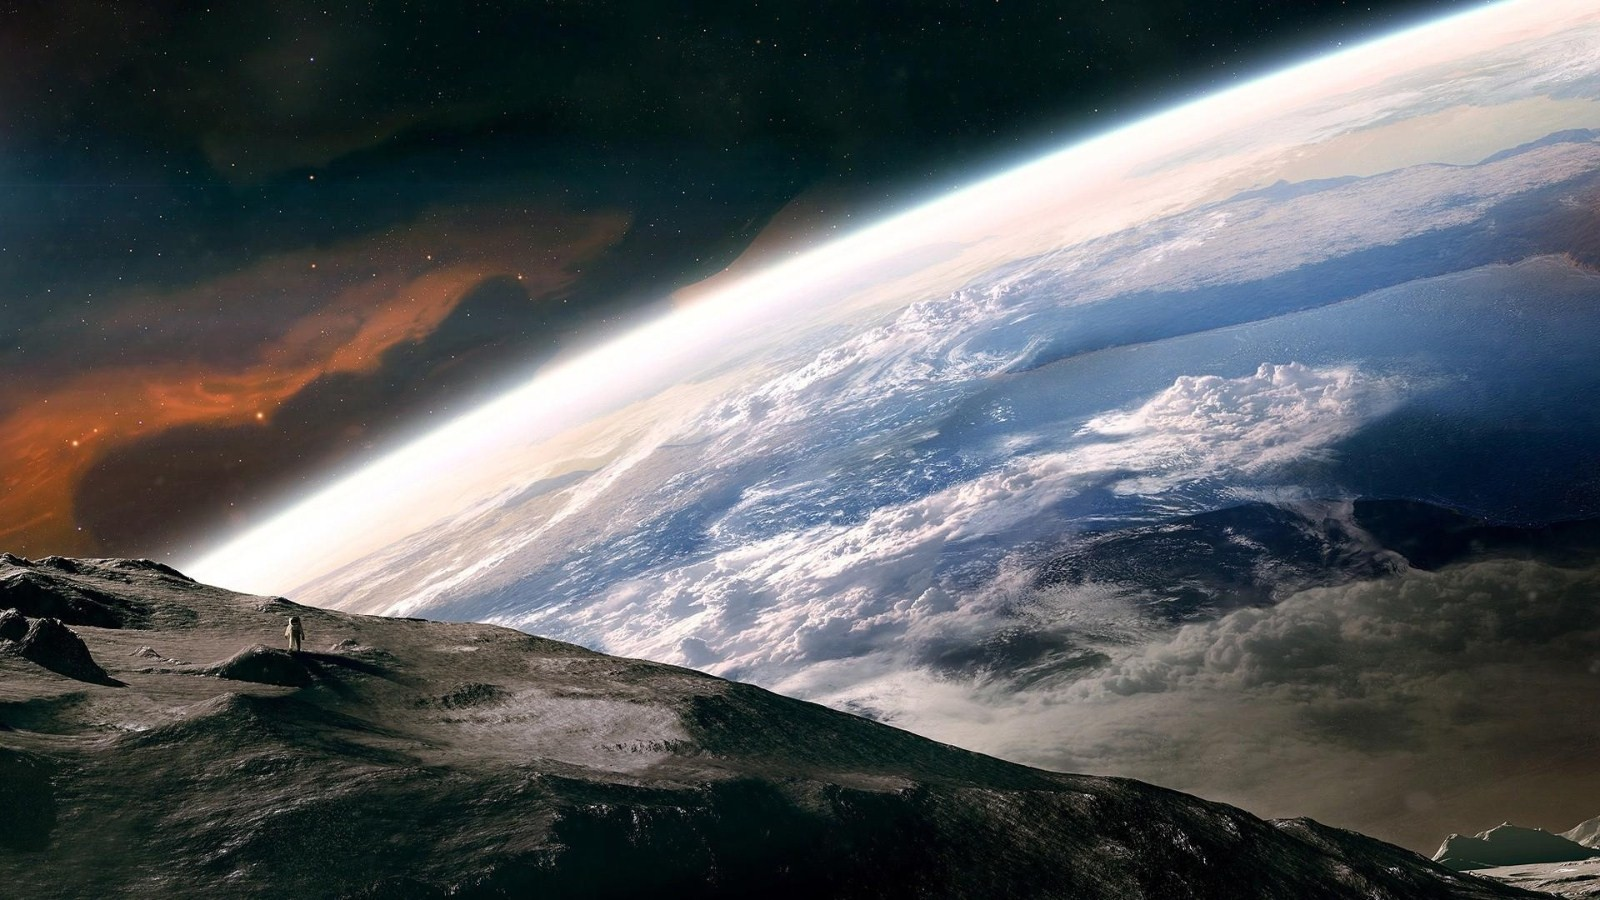 General 1600x900 space stars planet Moon spacesuit space art astronaut digital art